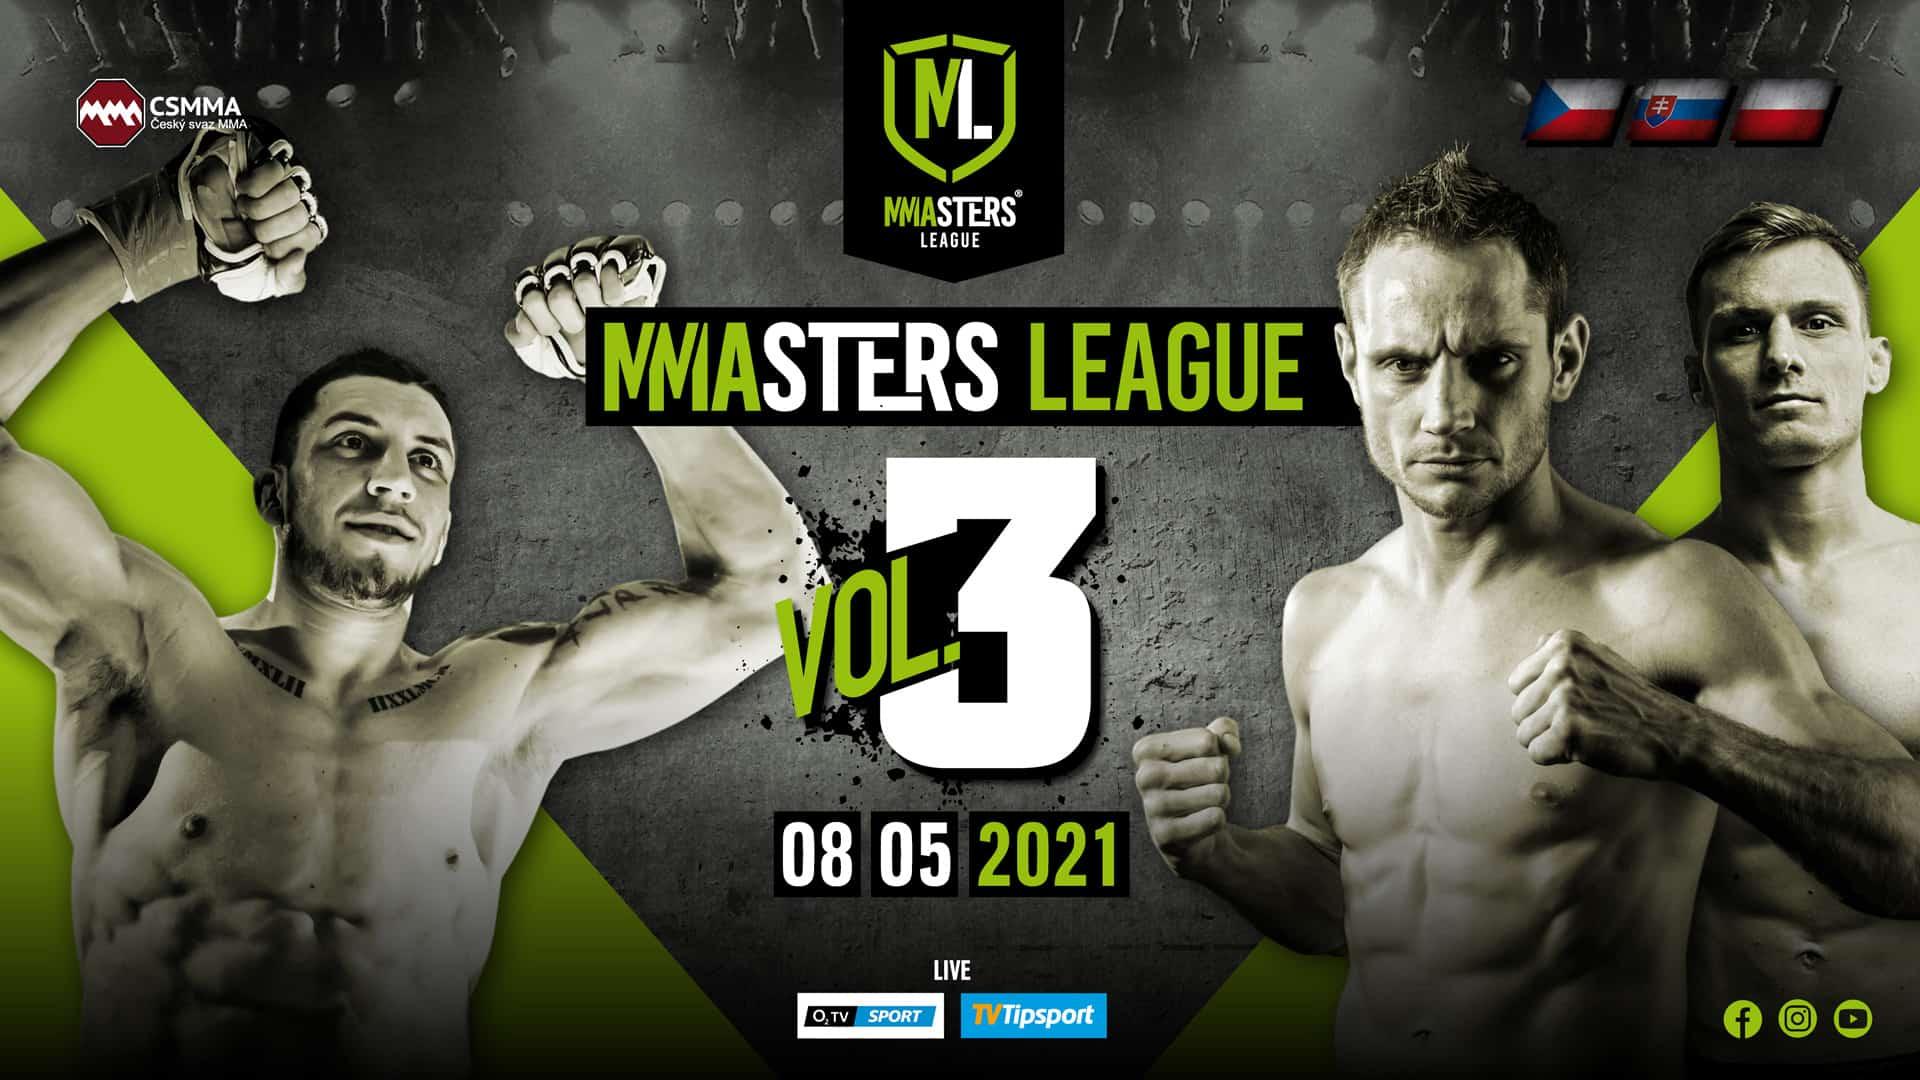 MMAsters League